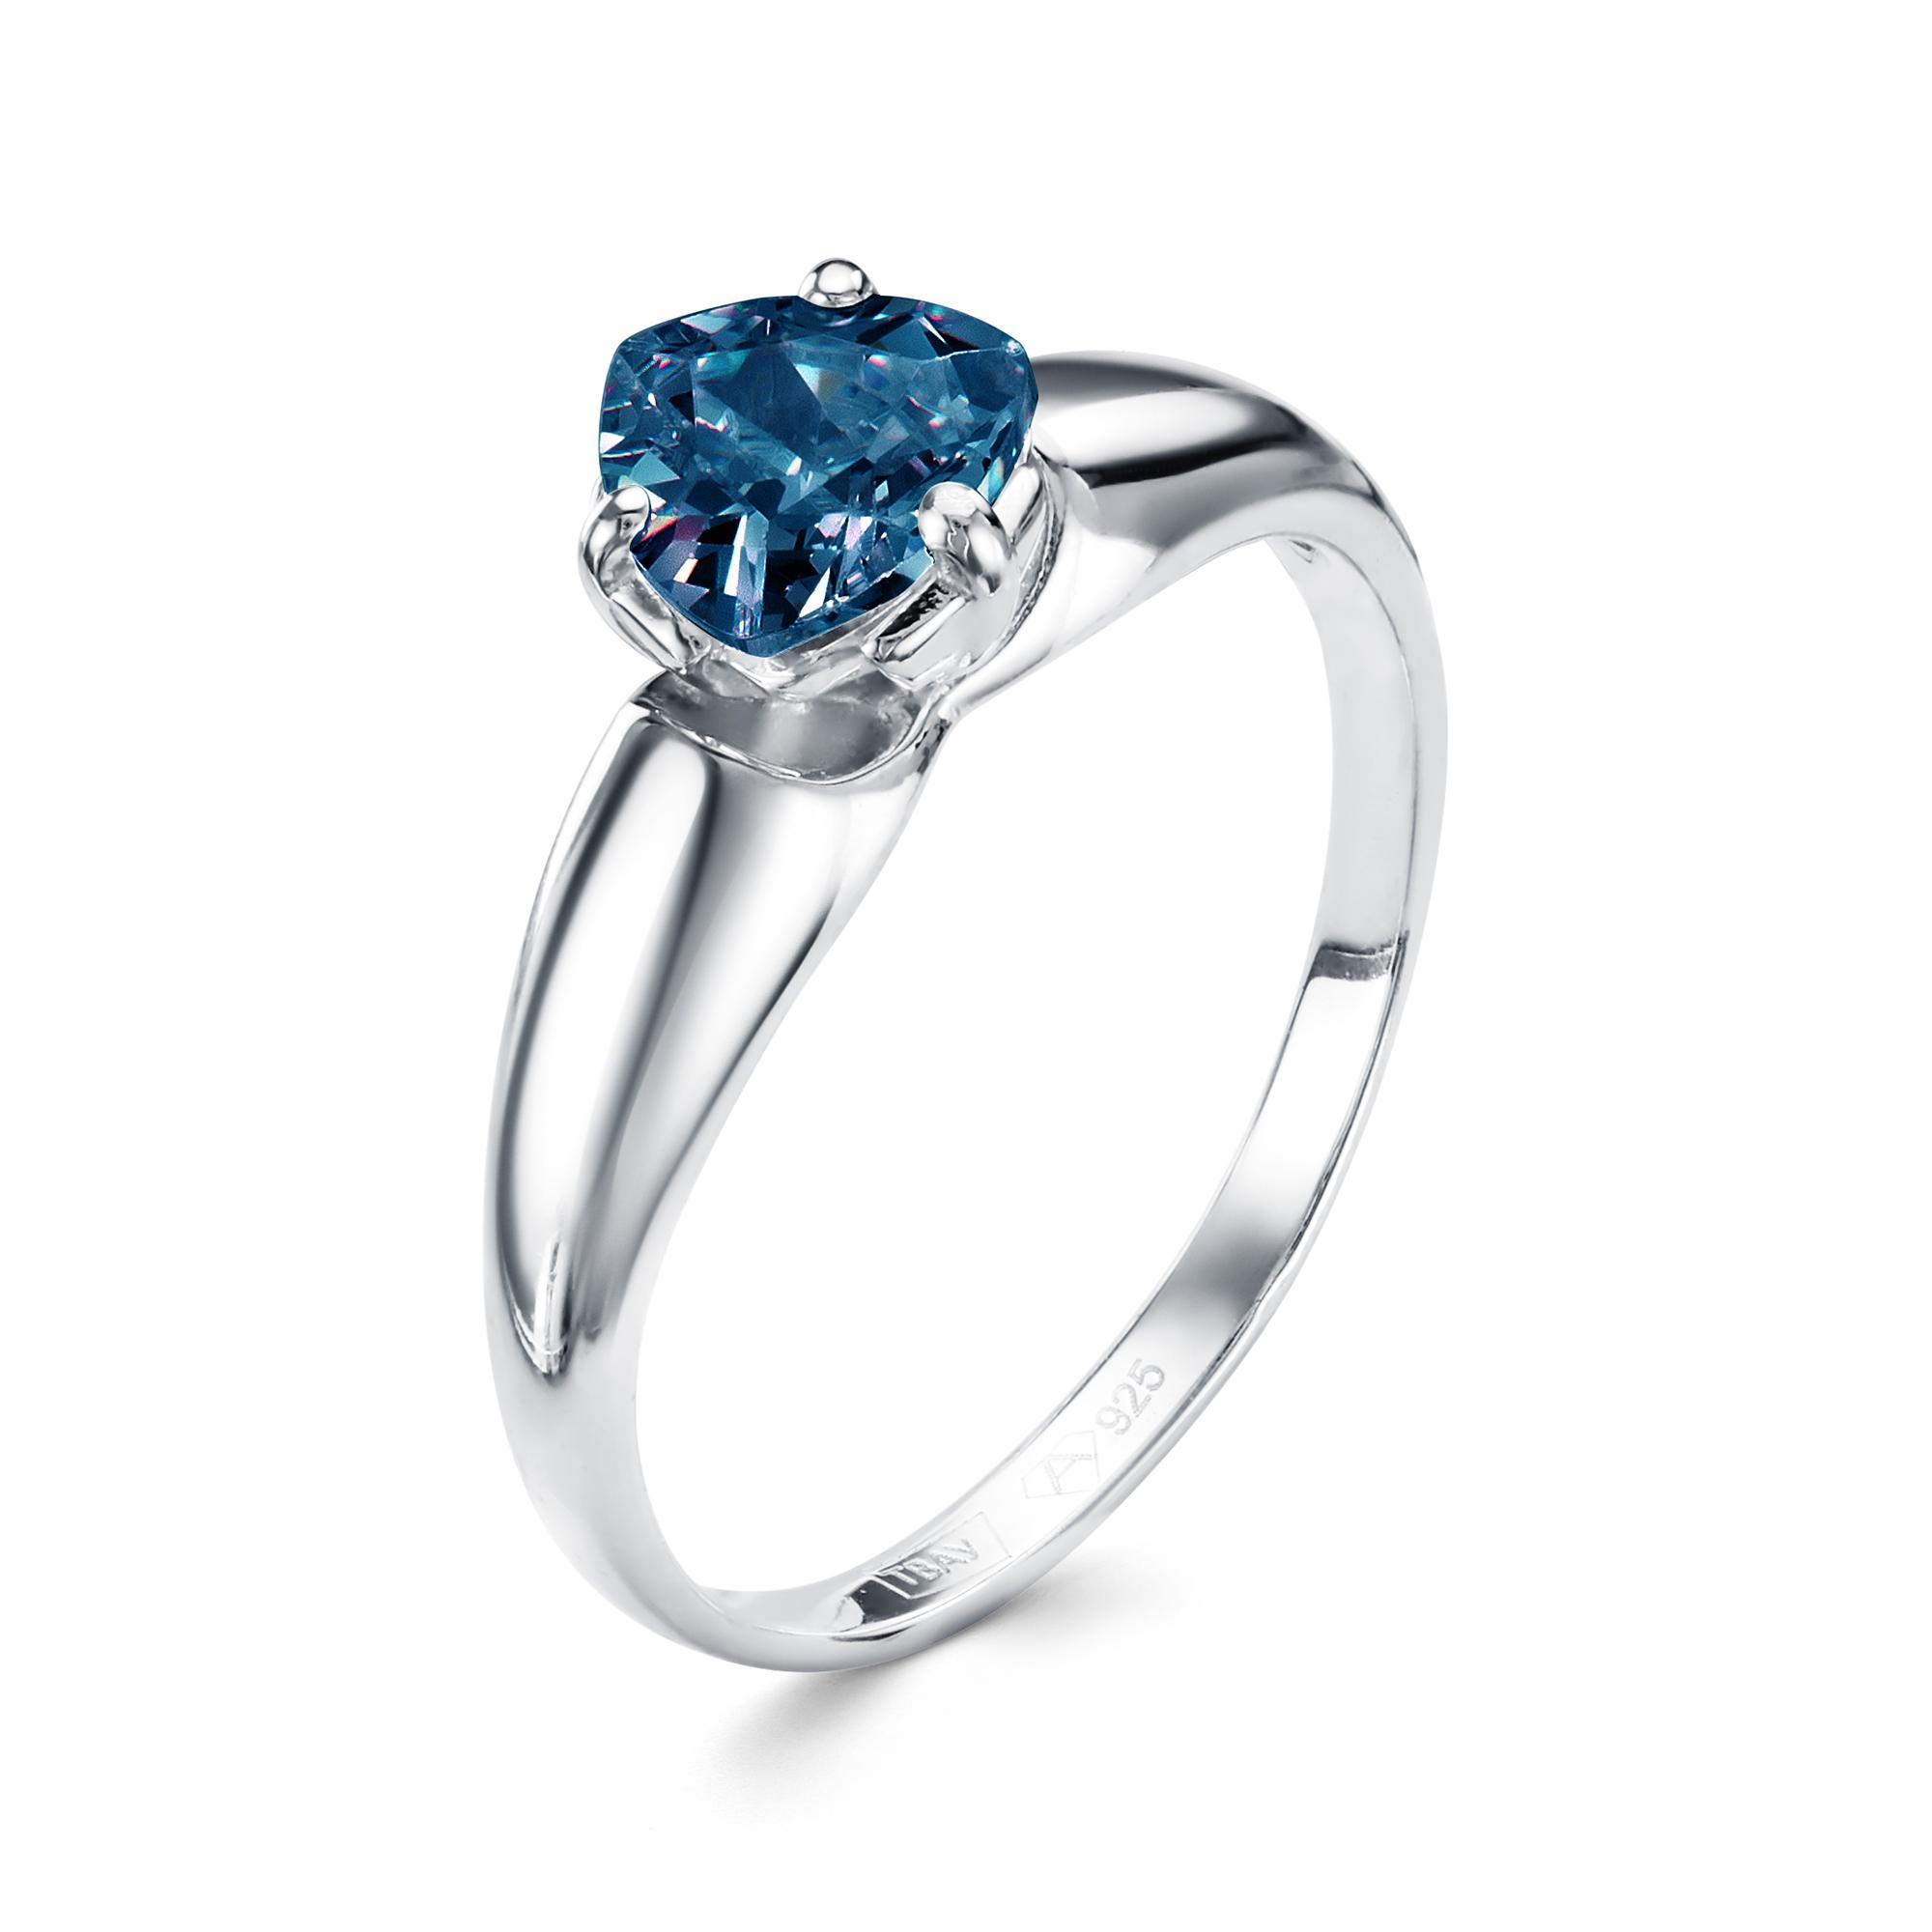 Серебряное кольцо Прочие арт. 01-0369/юстл-00 01-0369/юстл-00